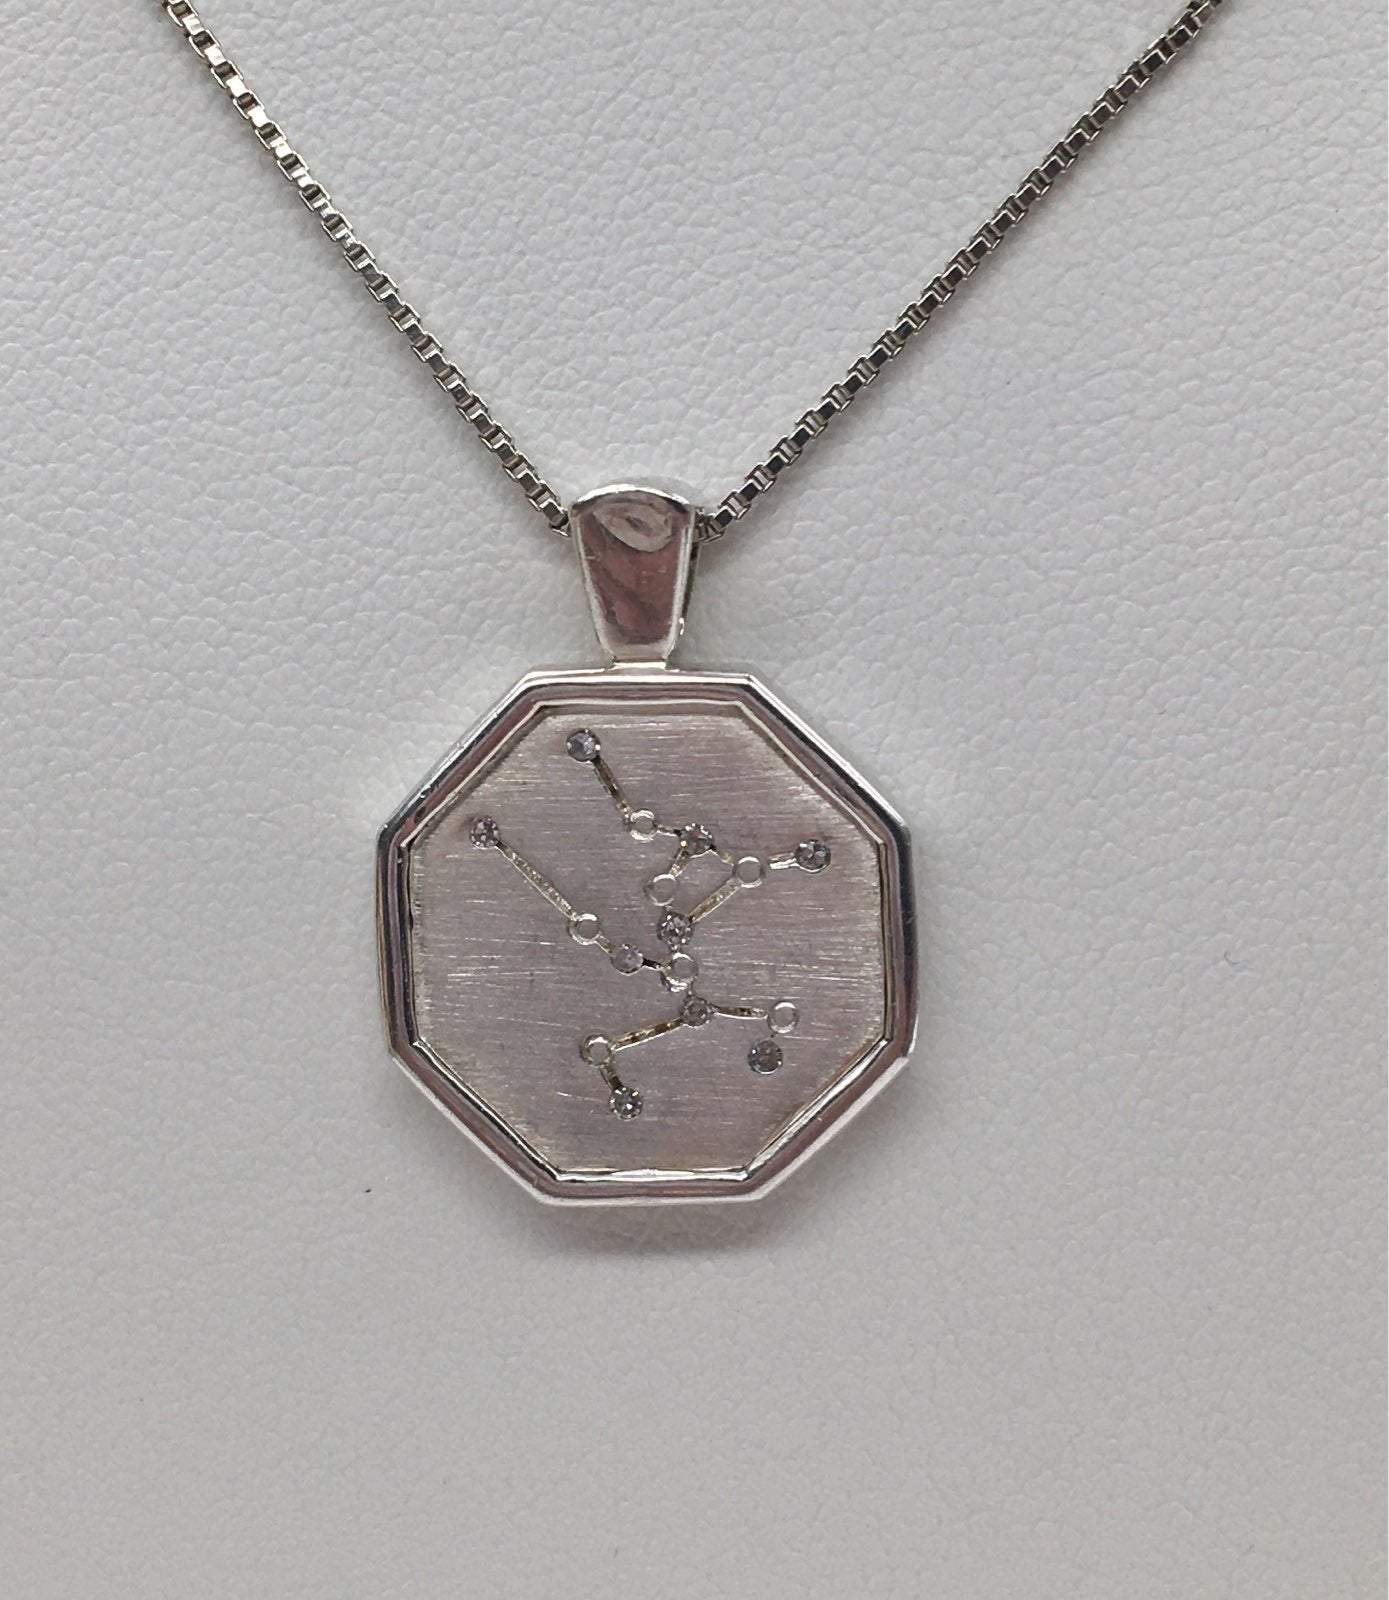 Vintage Sterling Constellation Necklace